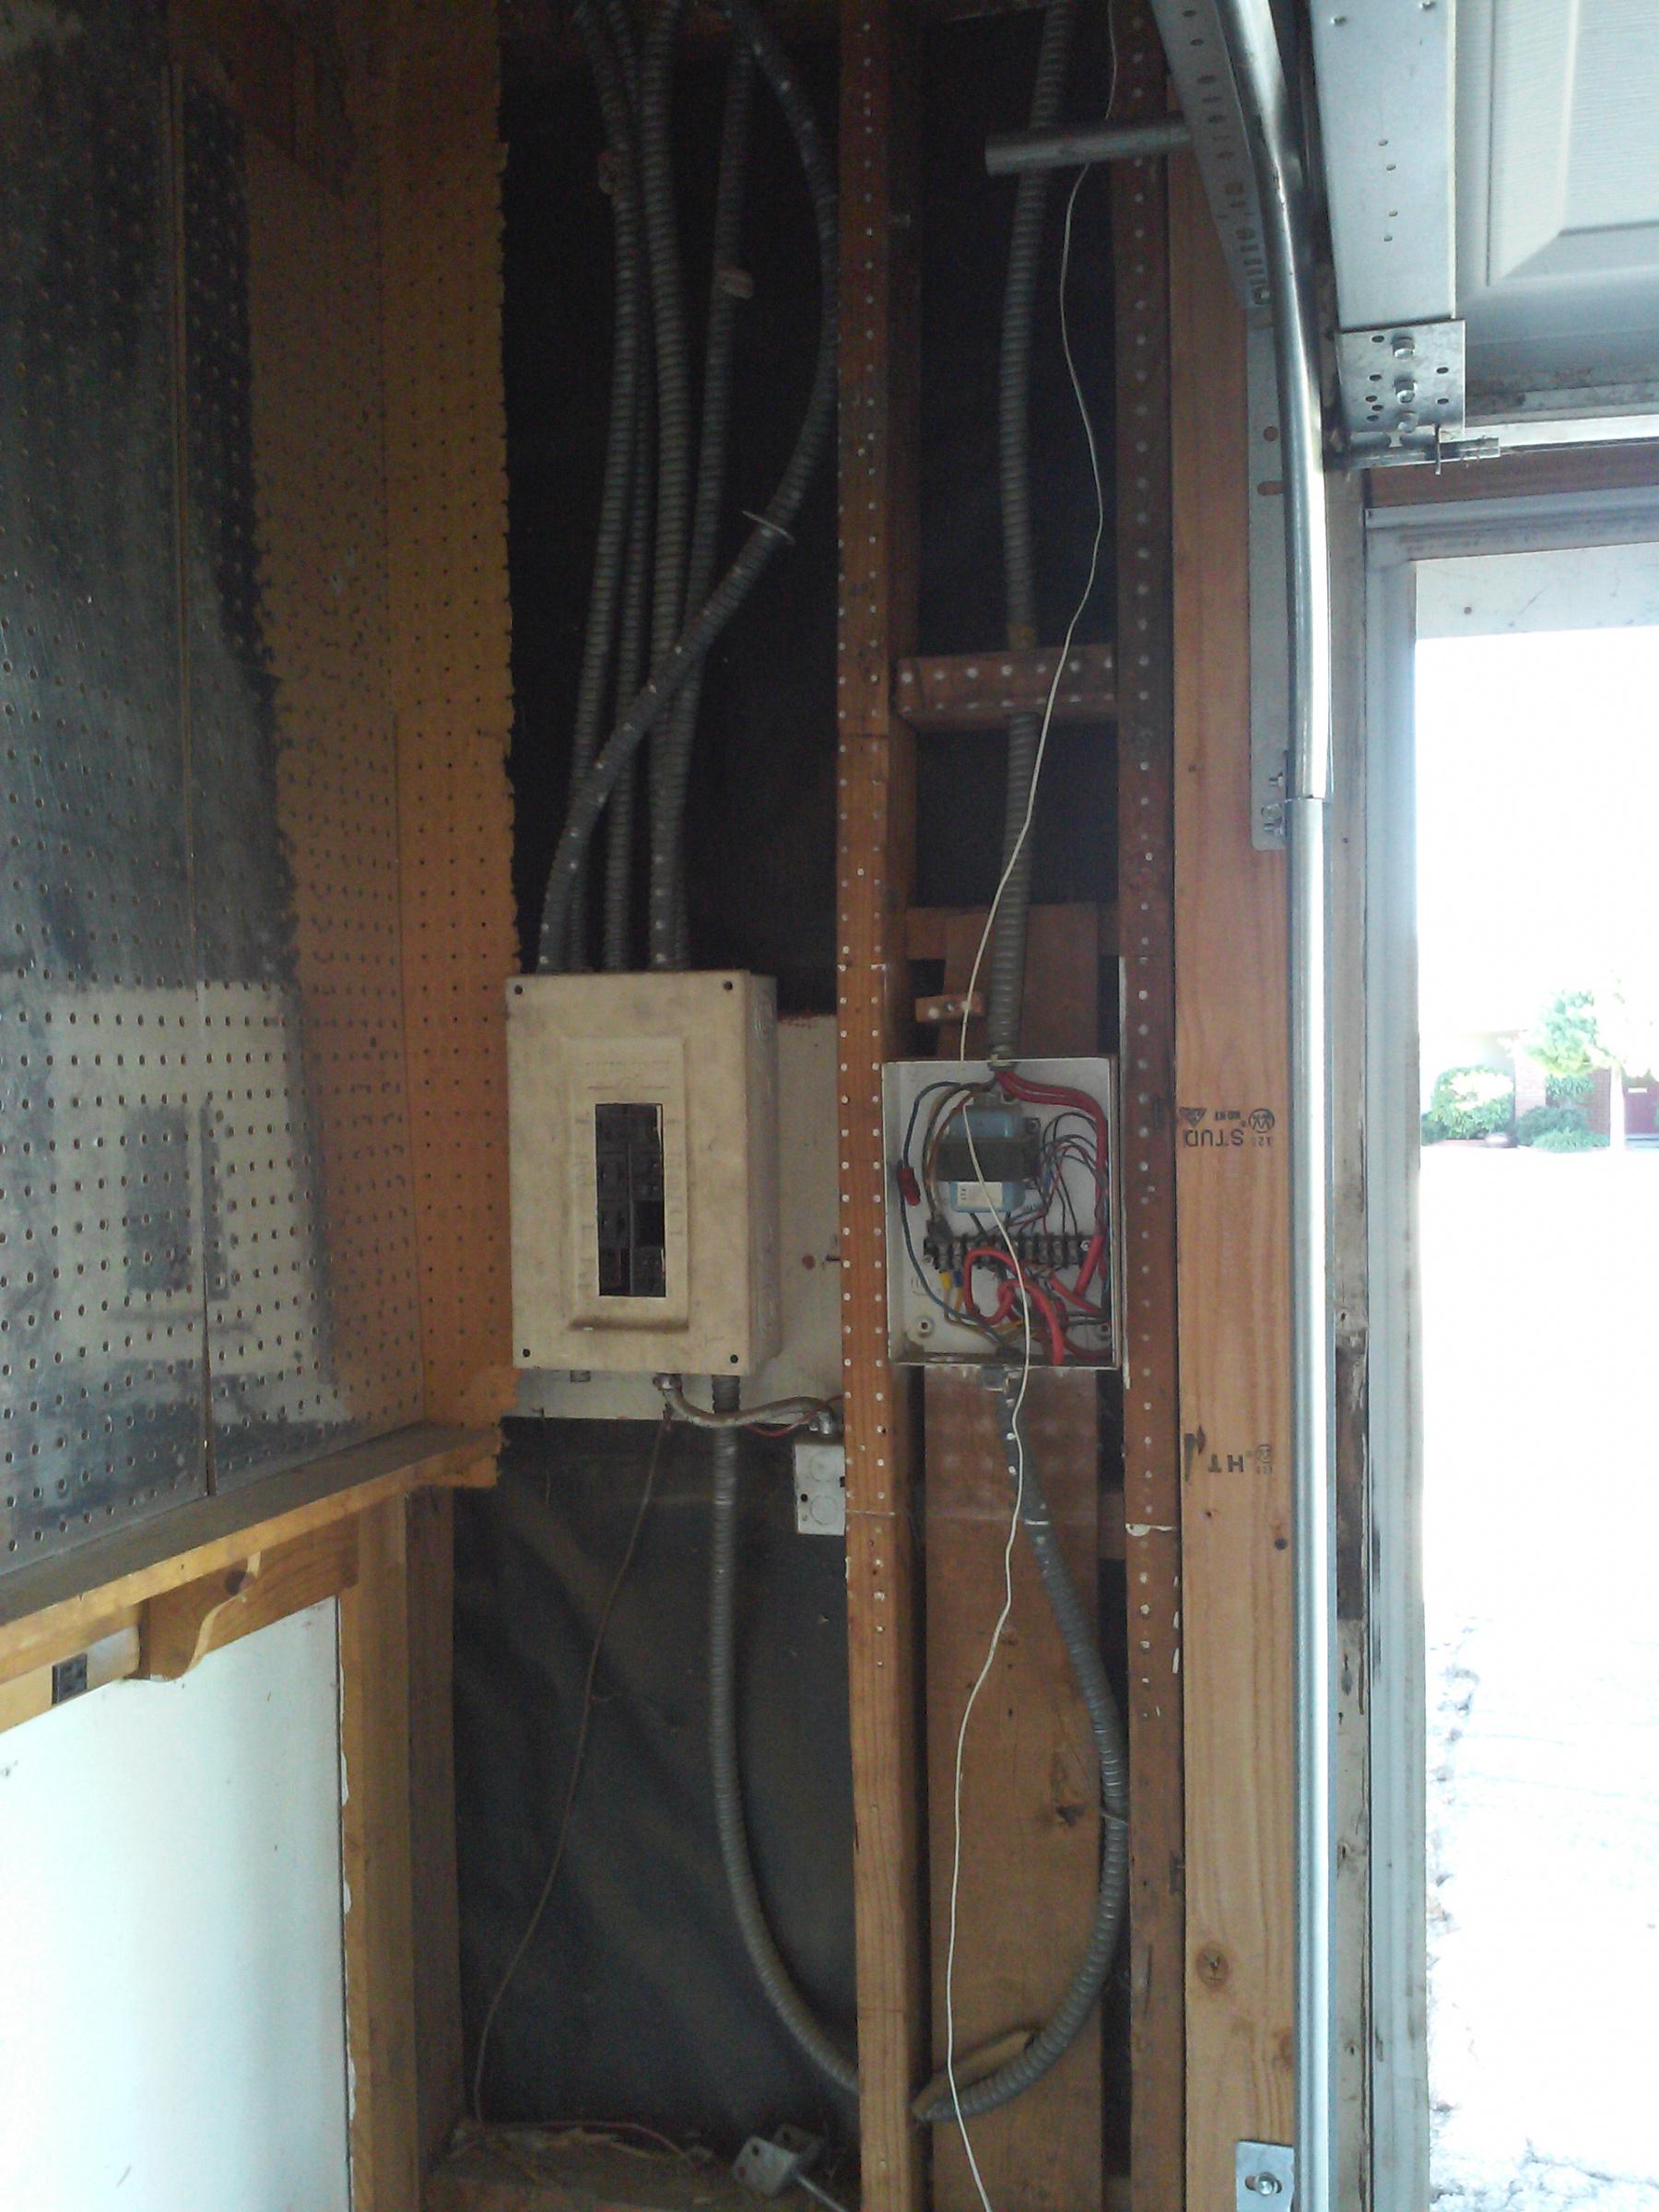 funky wiring in garage. Is this a hazard?-img_20190726_175441.jpg